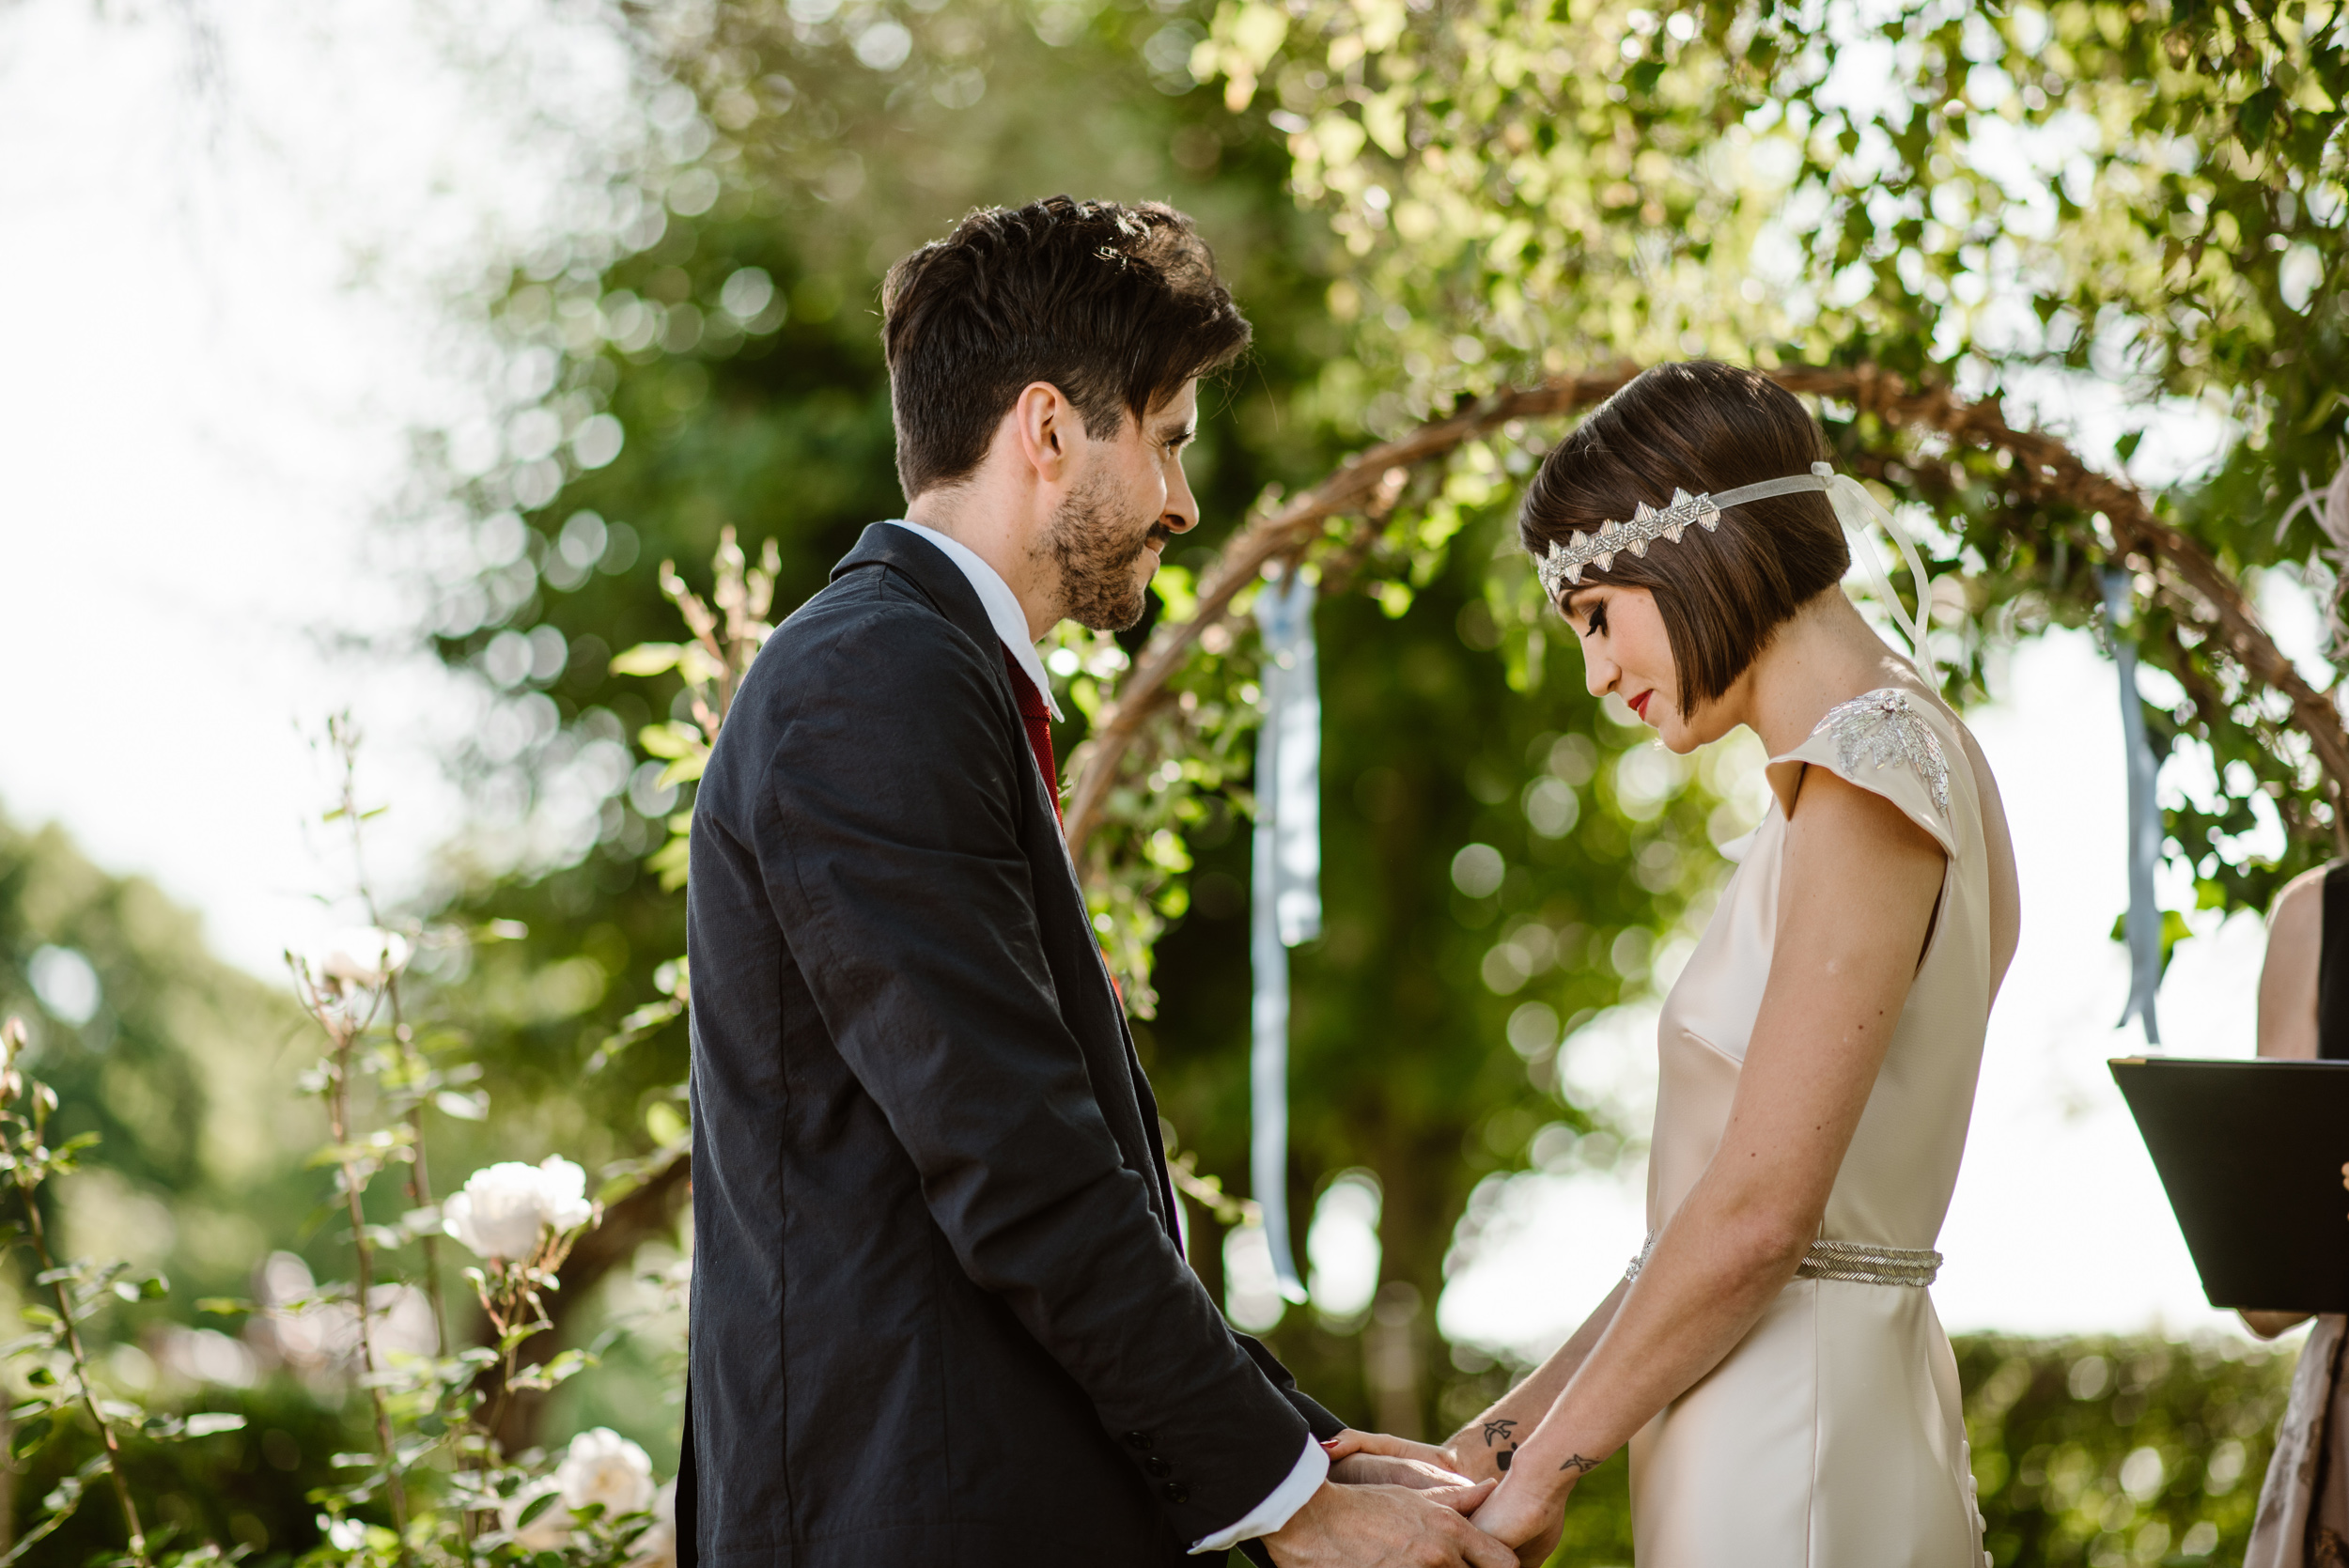 Ro-Kate-Beaumont-bias-cut-silk-wedding-gown-back-garden-wedding-by-Ellie-Gillard-6.jpg